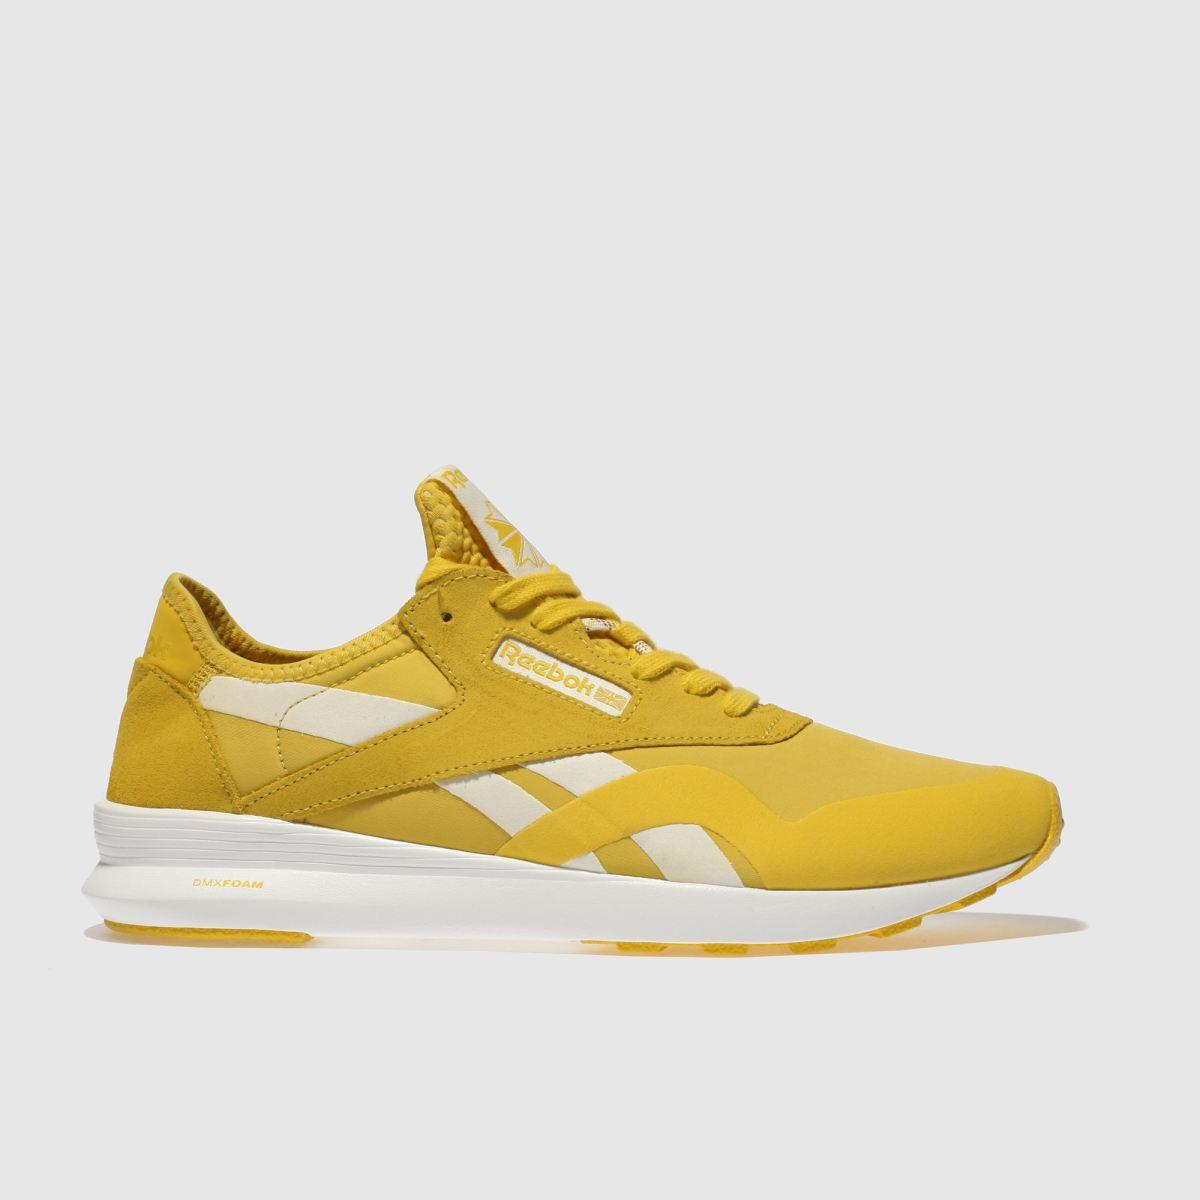 Reebok Yellow Classic Nylon Sp Trainers